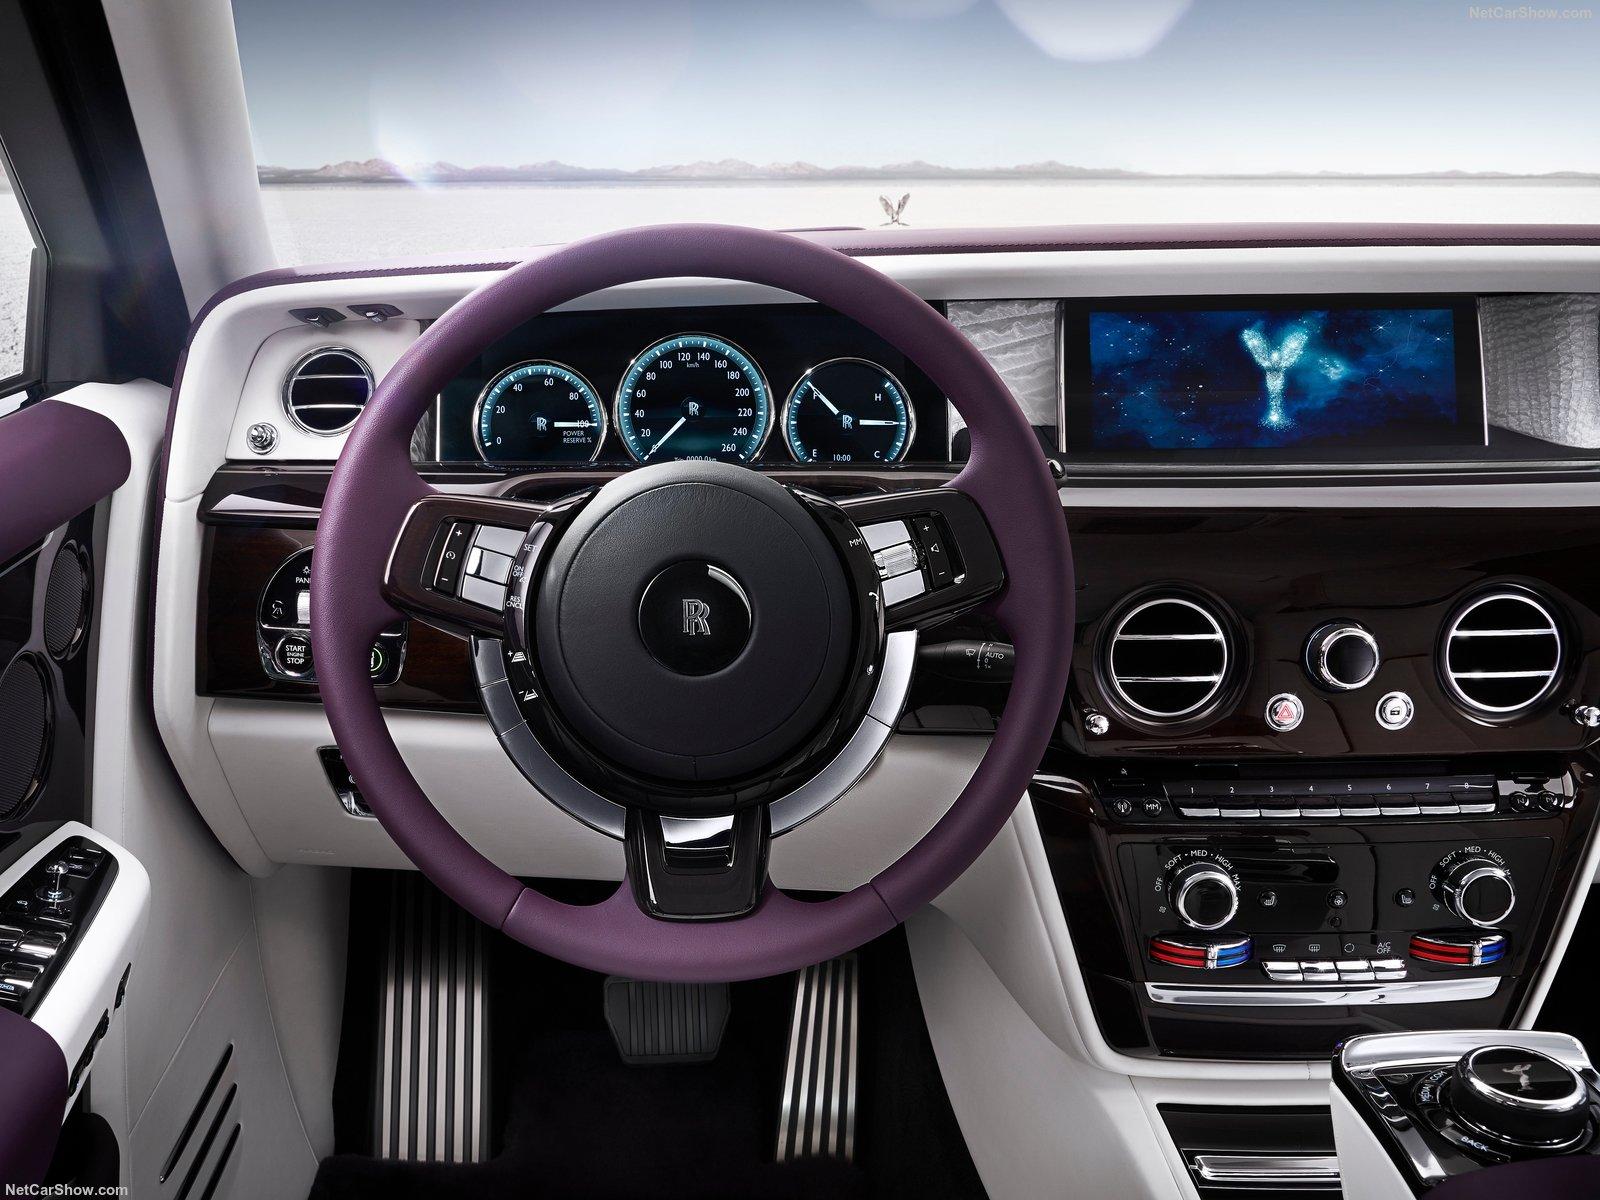 Rolls Royce Phantom 2018 1600 09 Pakwheels Blog